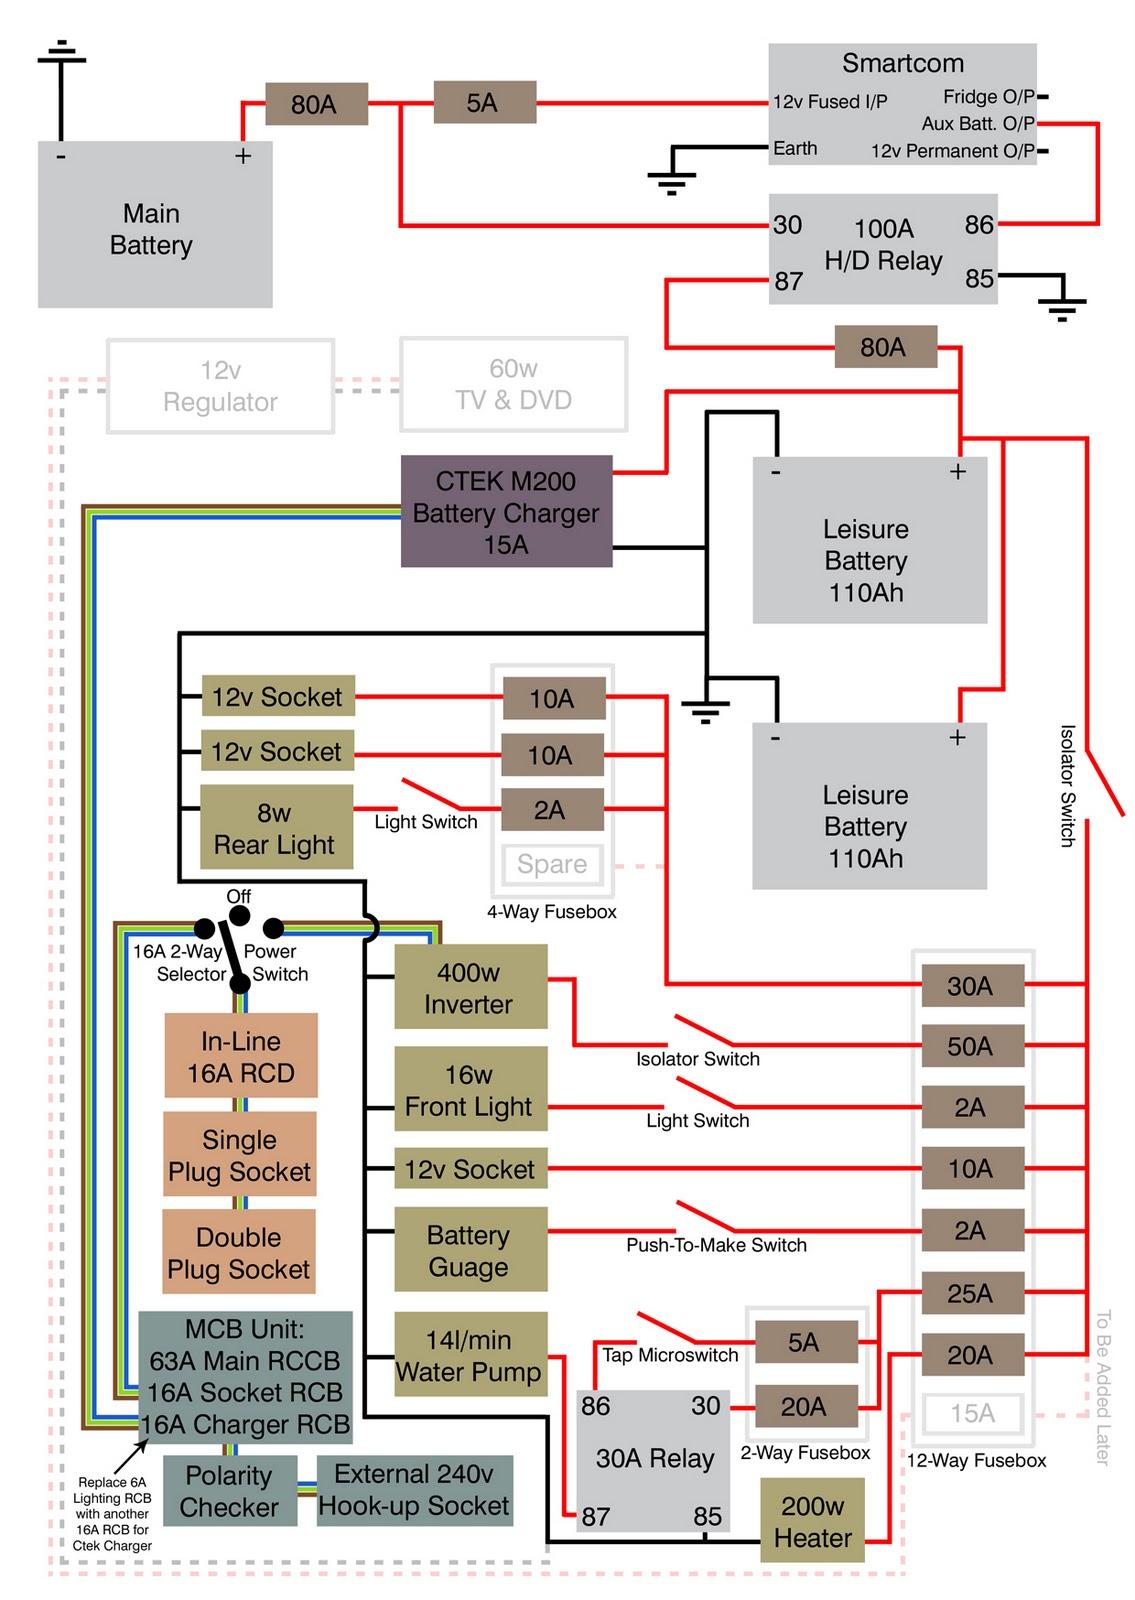 Leisure Battery Wiring Diagram: Xsav11801 Wiring Diagram Wiring Diagram Symbols u2022 Cairearts.com,Design